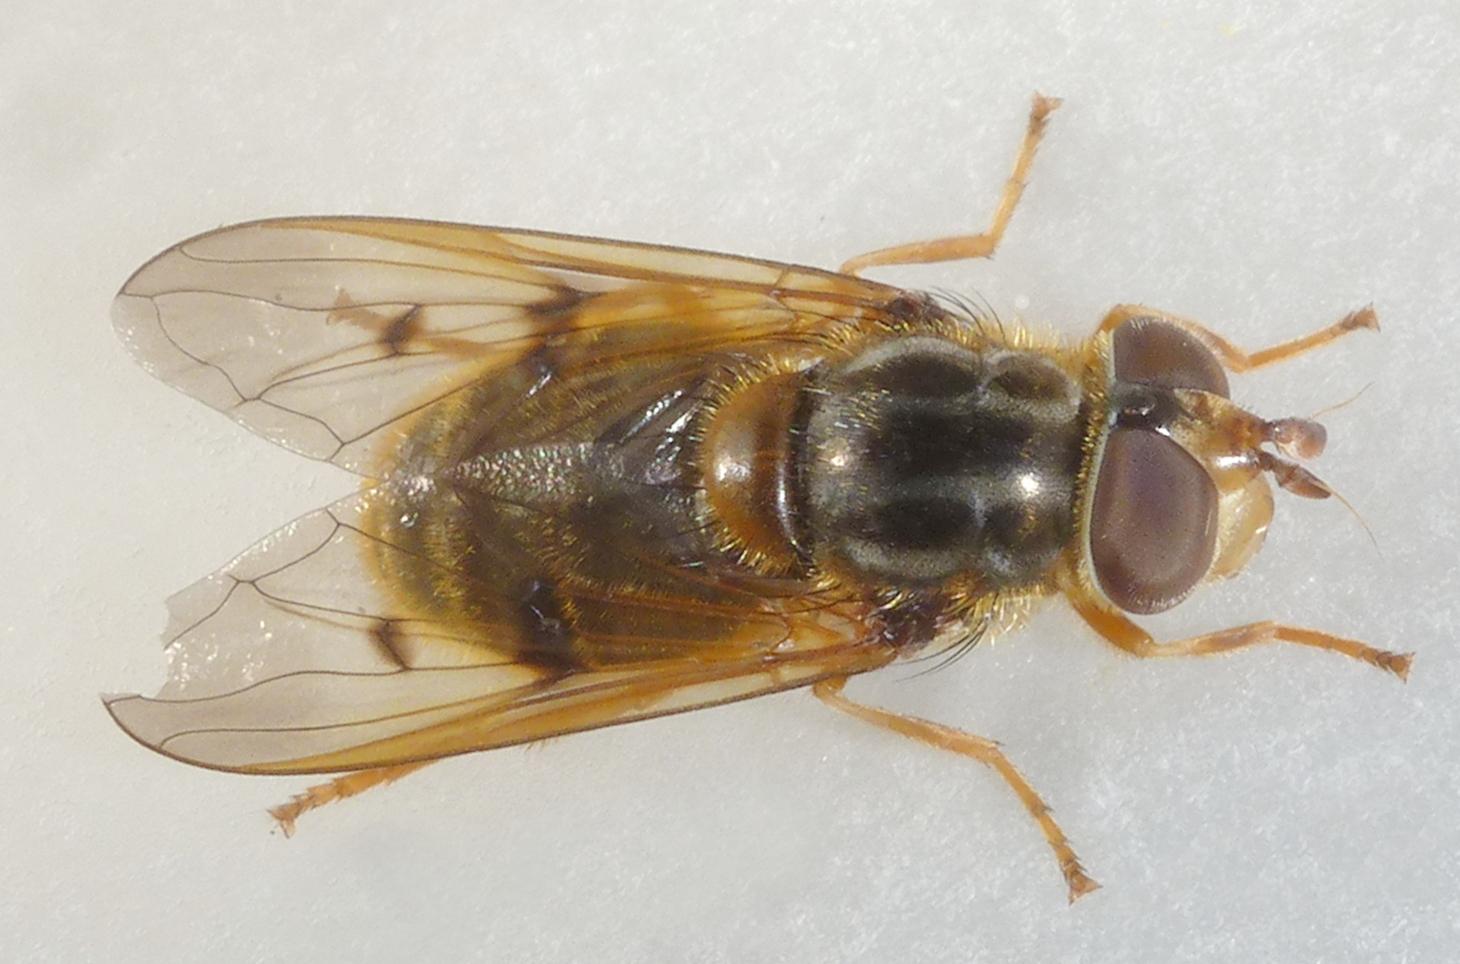 Fiche espèce – Un syrphe rare : Ferdinandea ruficornis (Fabricius, 1775) !